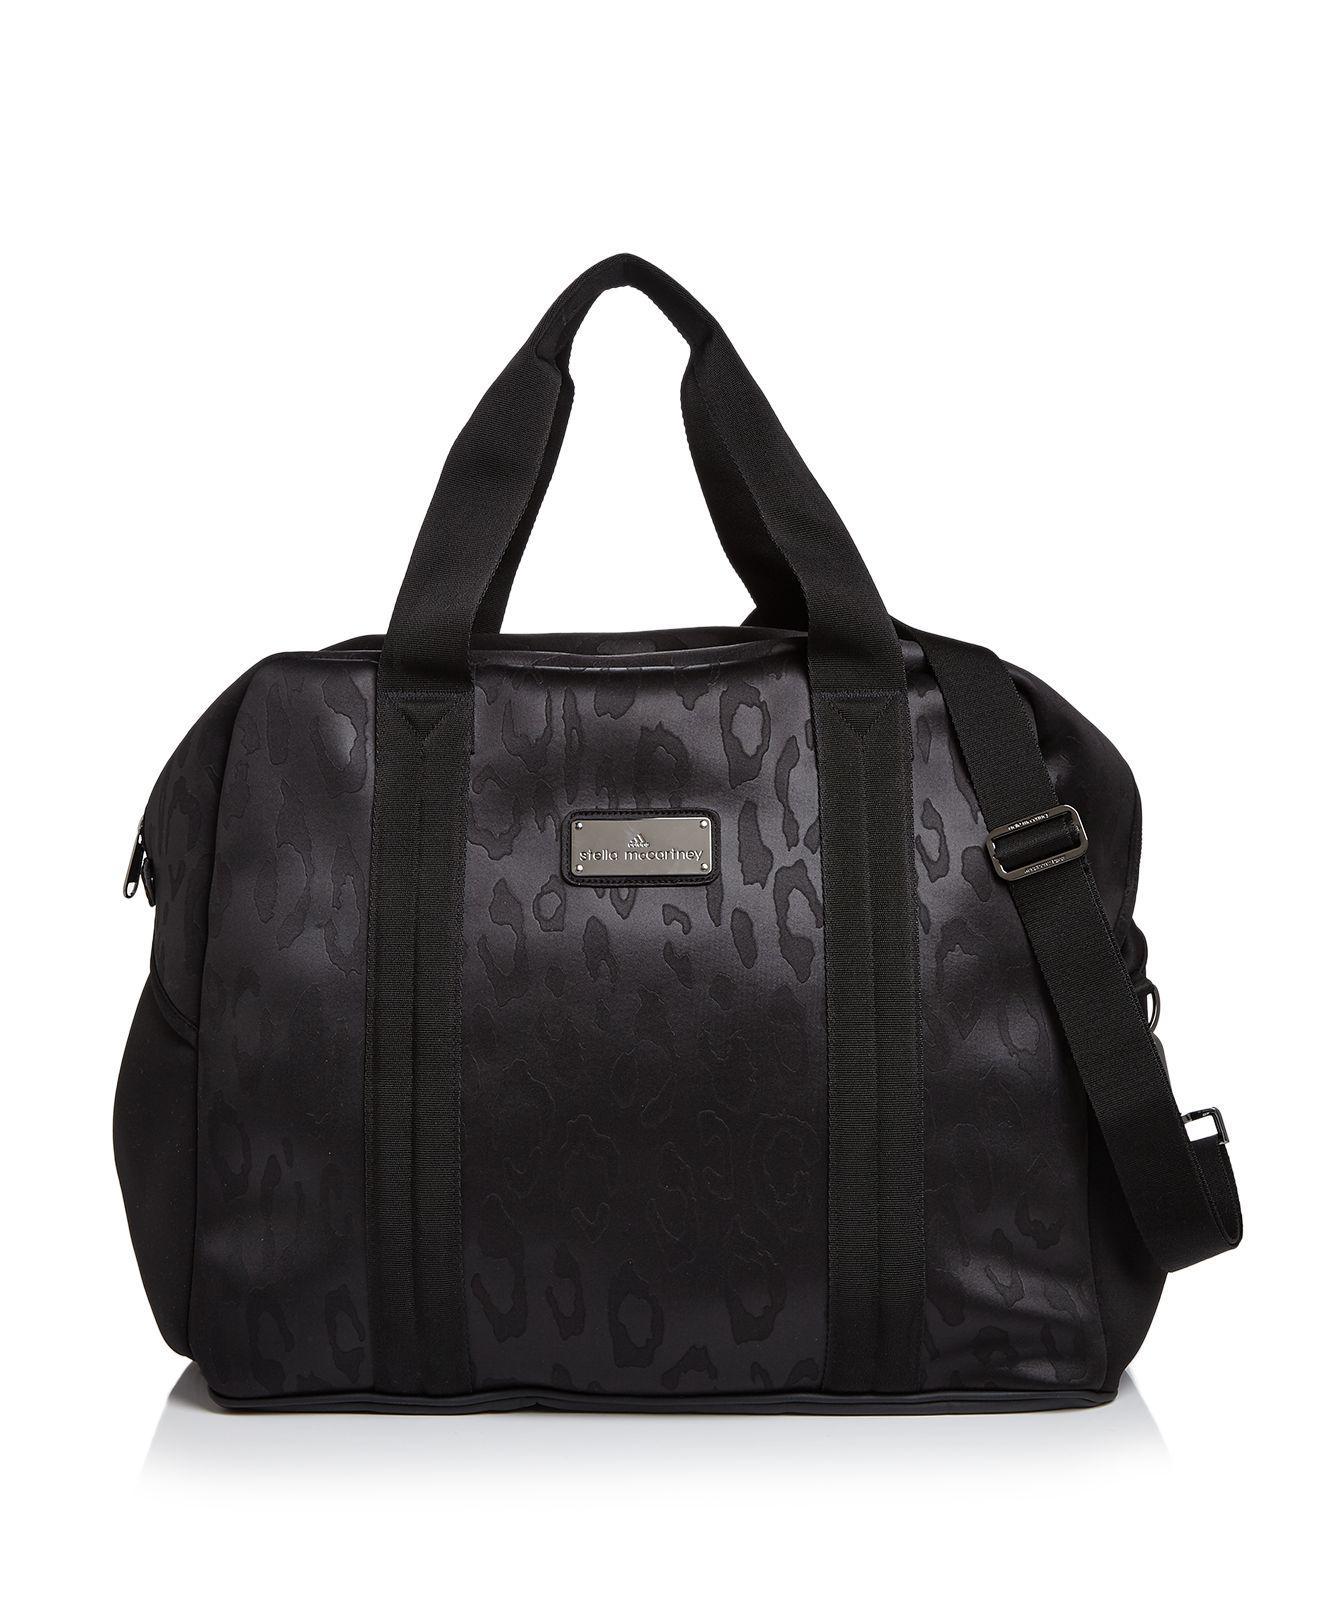 4f0341fc8dd0 Where To Buy Big Gym Bags